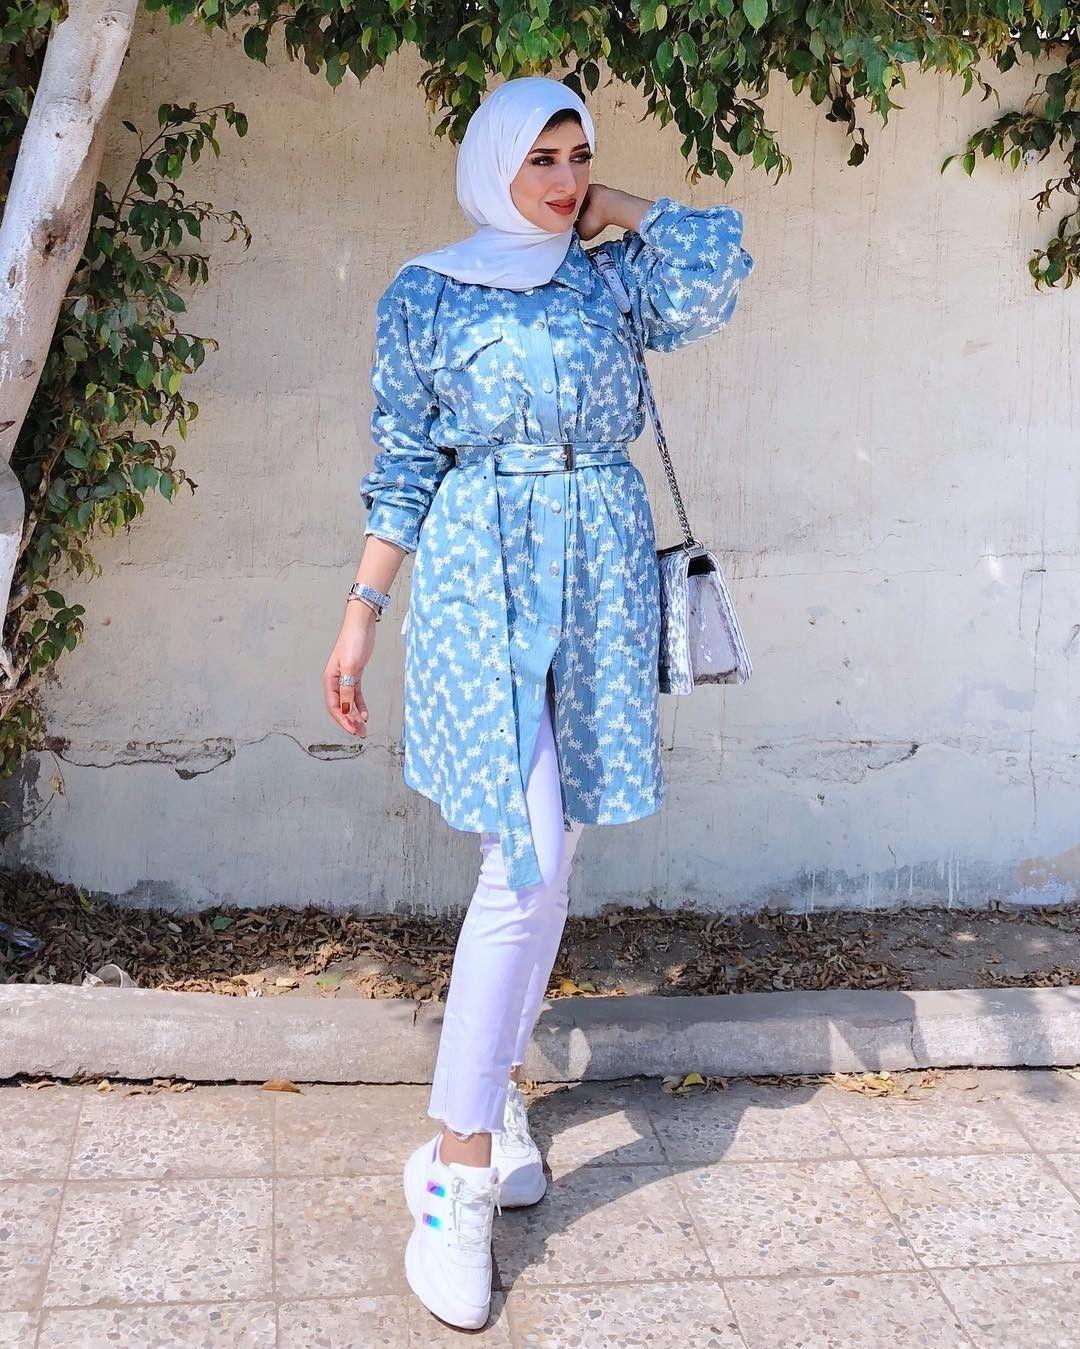 How To Style Light Blue Hijab Outfits Fashion Fashion Outfits Blue Outfit